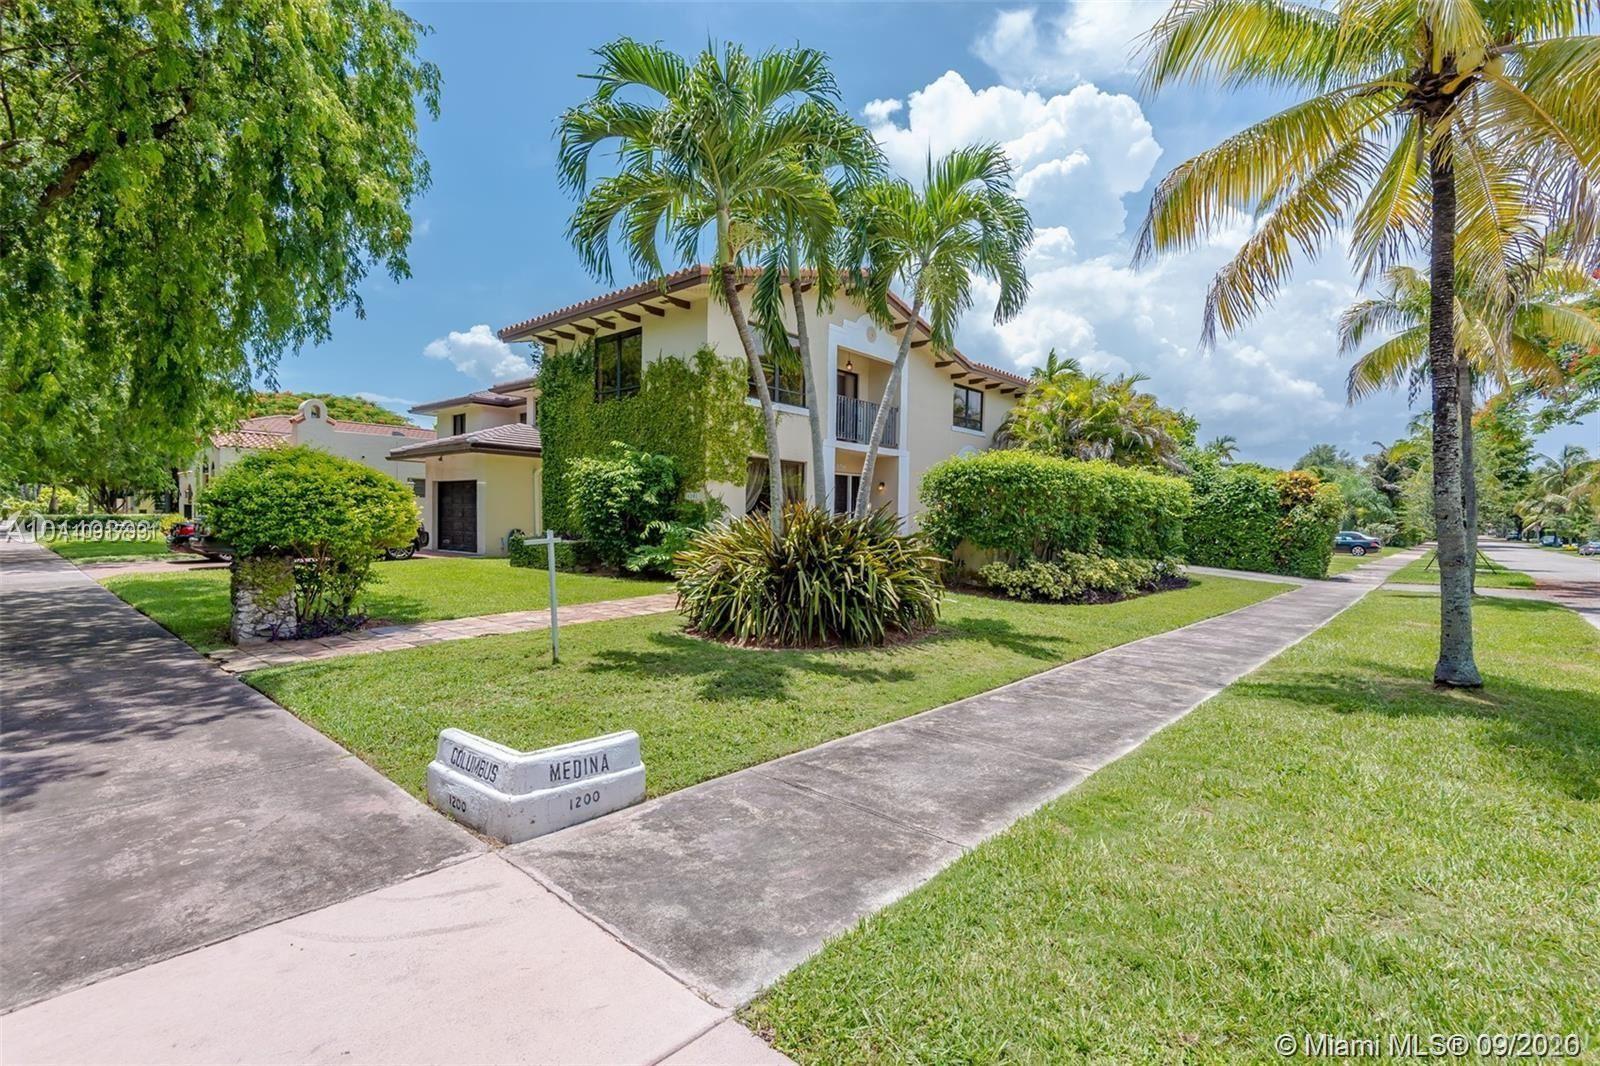 1202 Columbus Blvd, Coral Gables, FL 33134 - #: A10917991